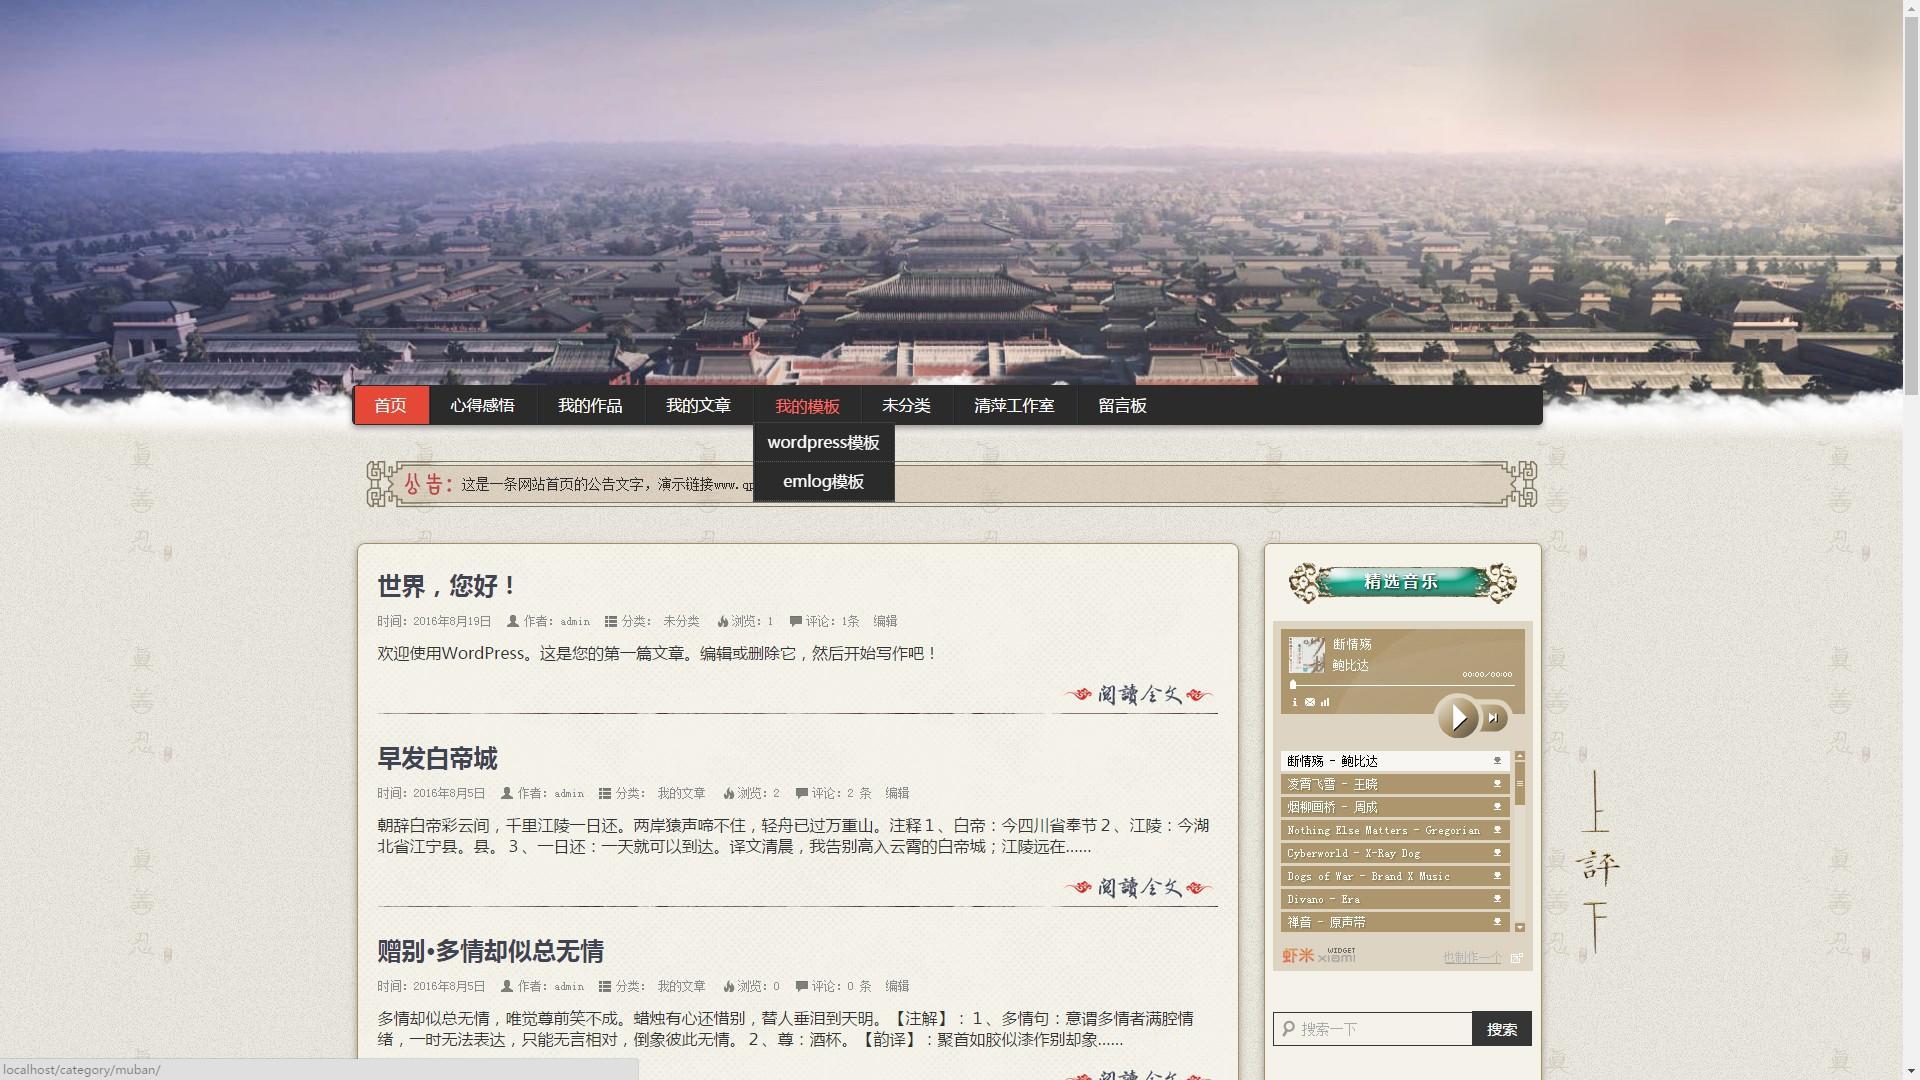 WordPress博客主题博闻广记免费版-WP迷死